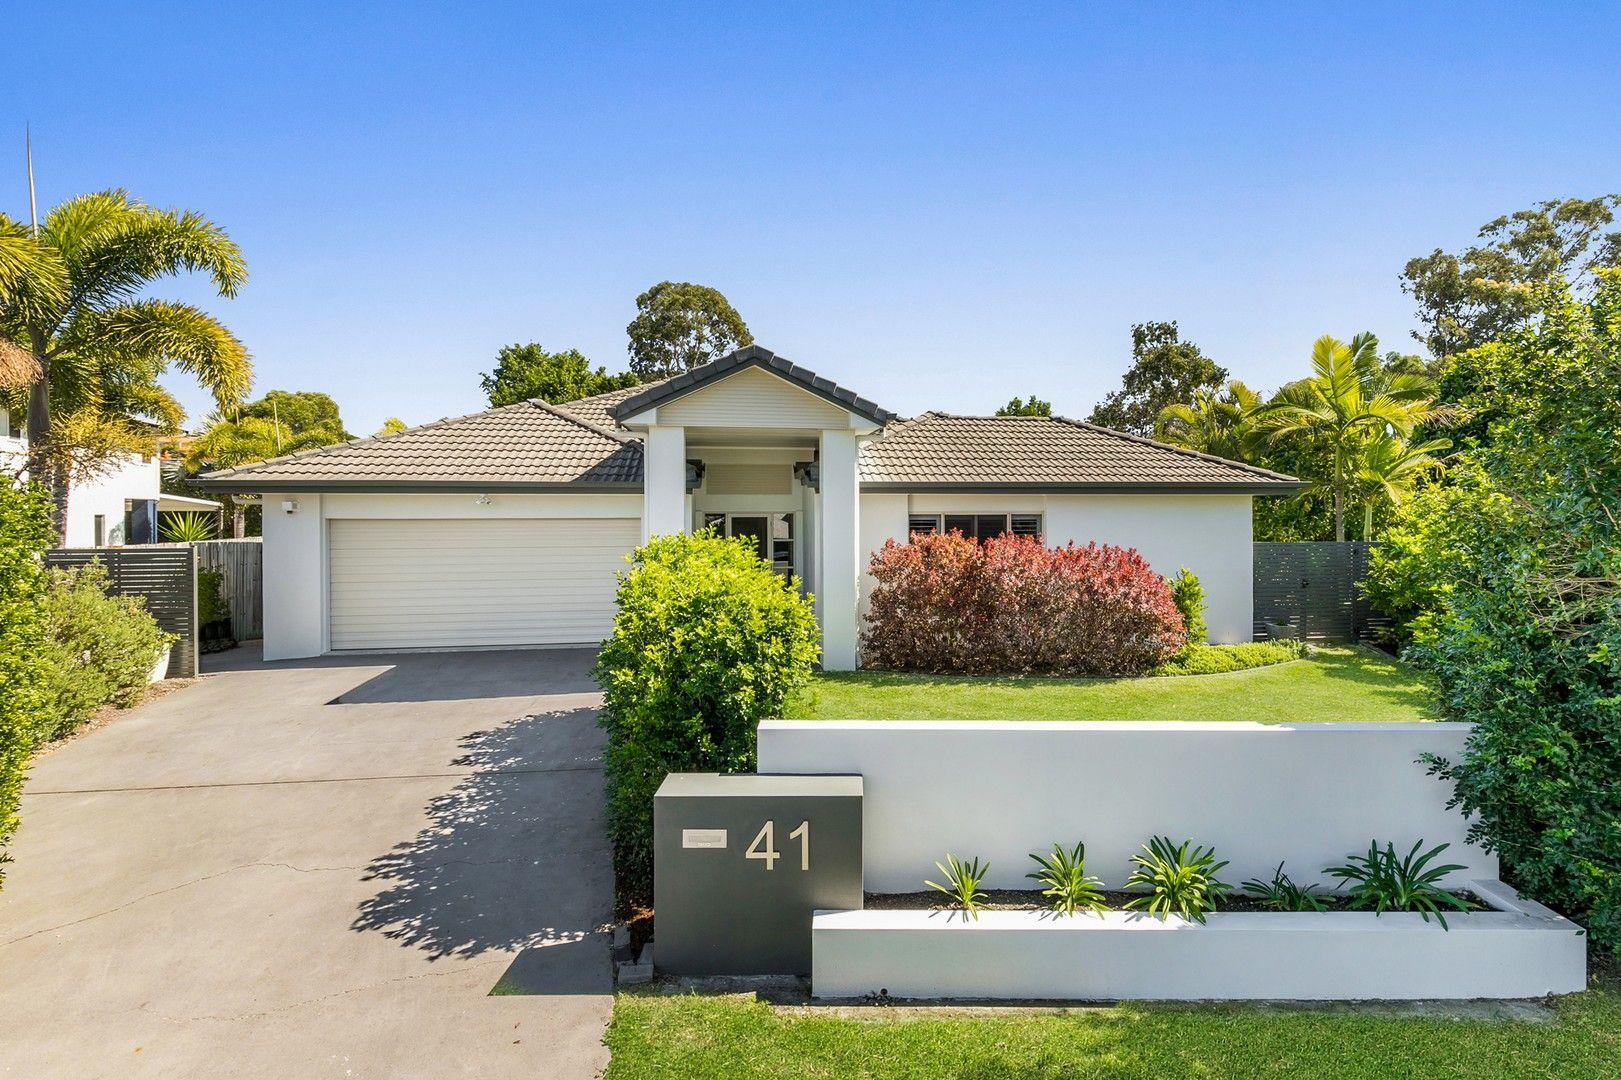 41 Edenbrooke Drive, Sinnamon Park QLD 4073, Image 0